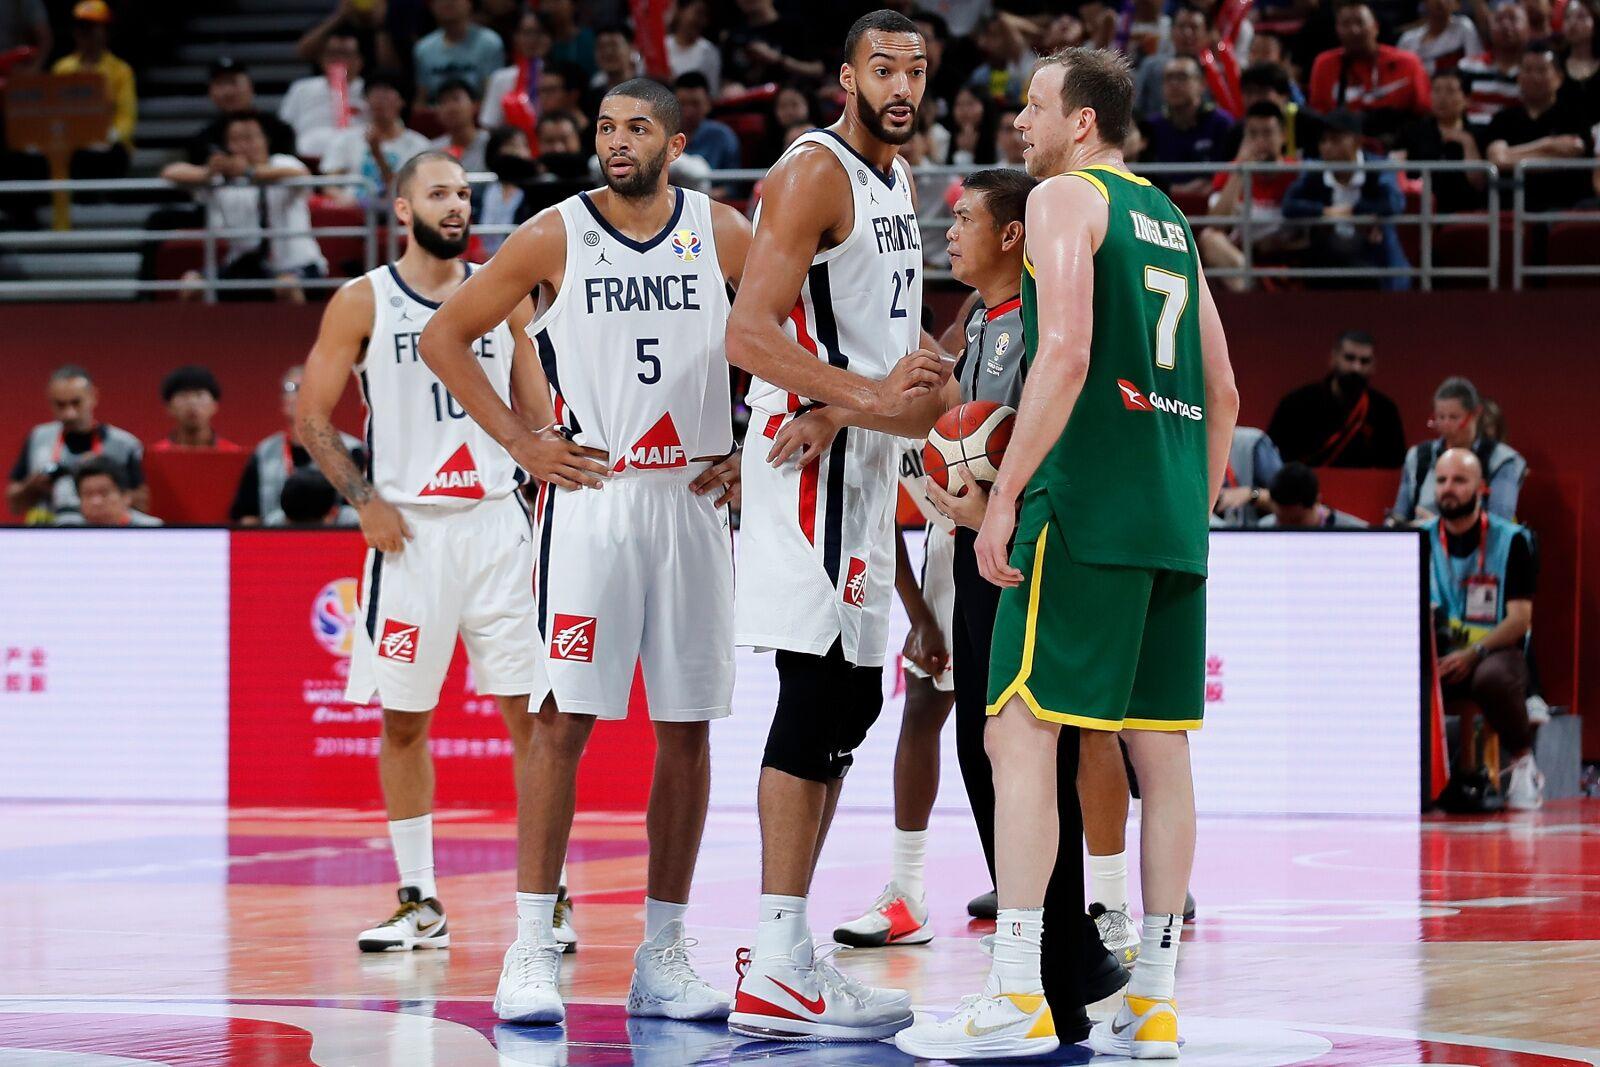 Utah Jazz Podcast: Reviewing Utah Jazz players in FIBA and predicting what's ahead